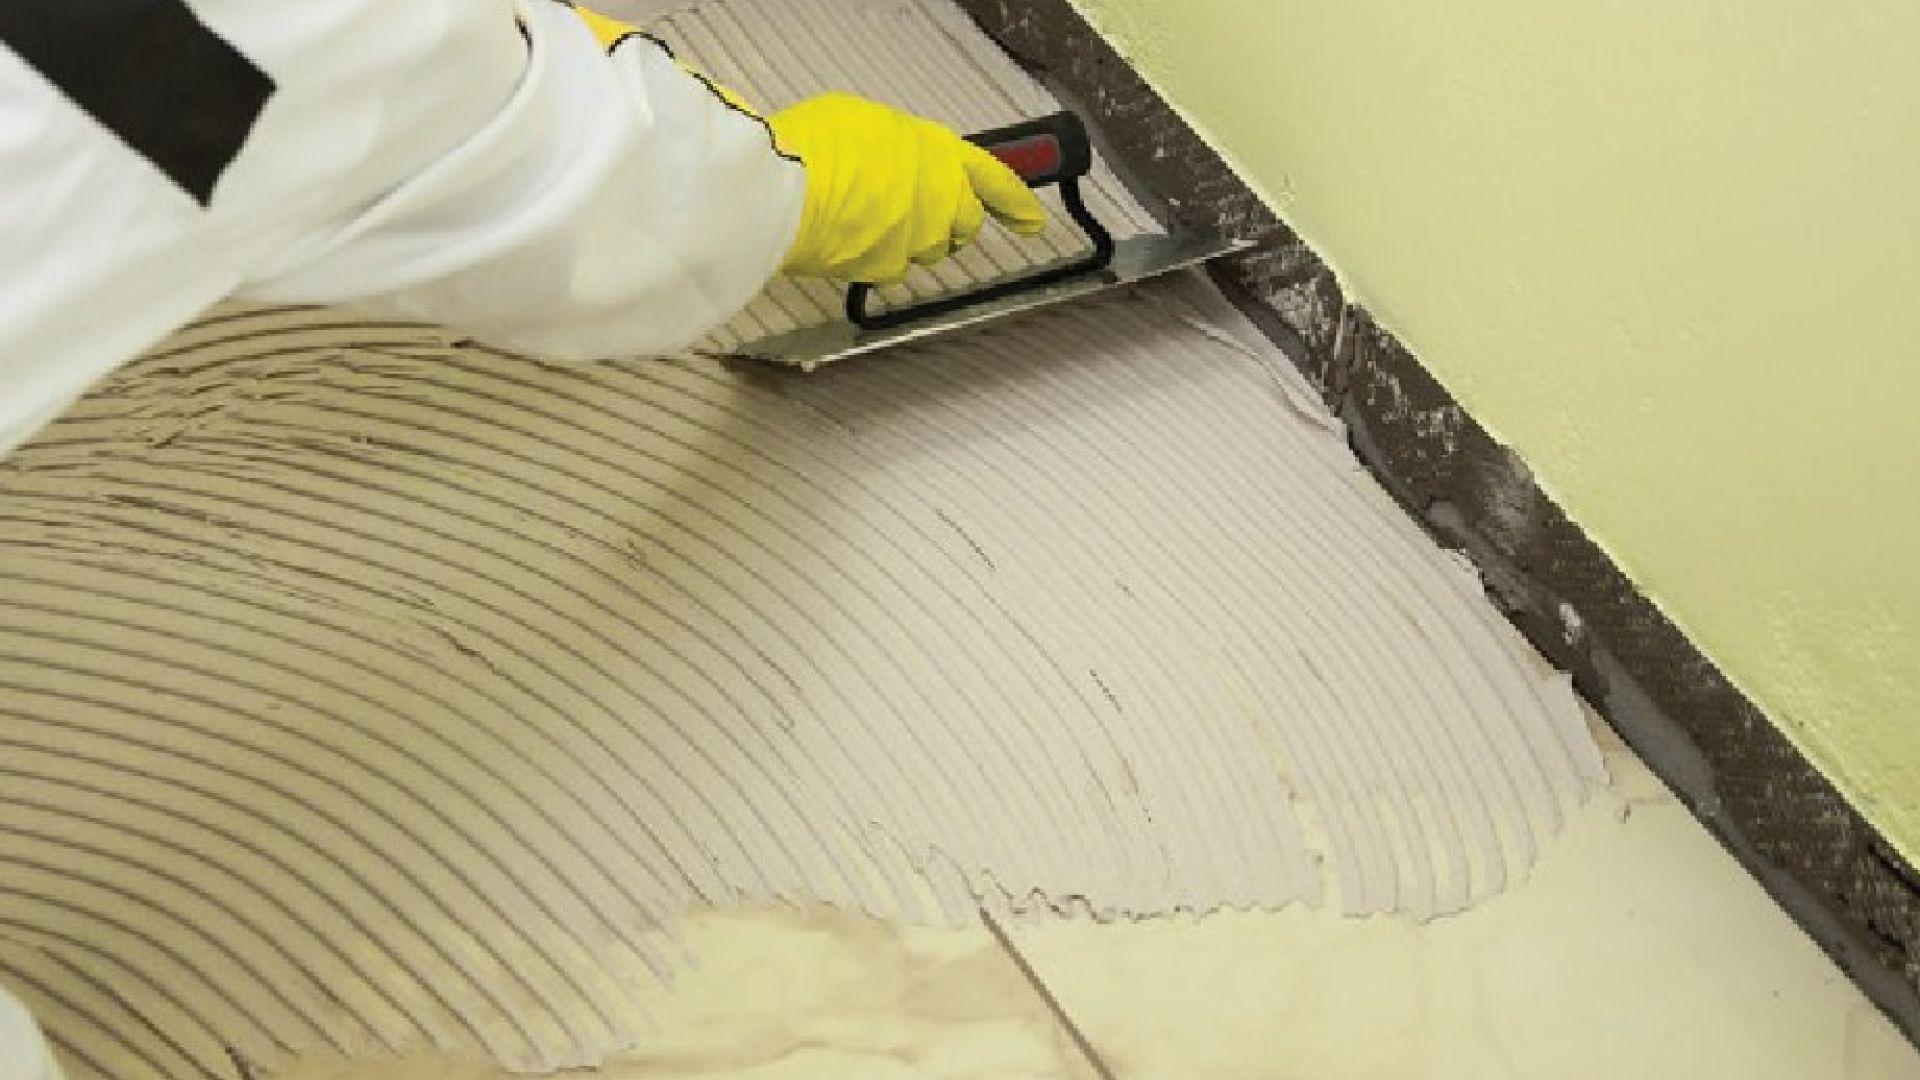 use tile adhesive to lay tiles